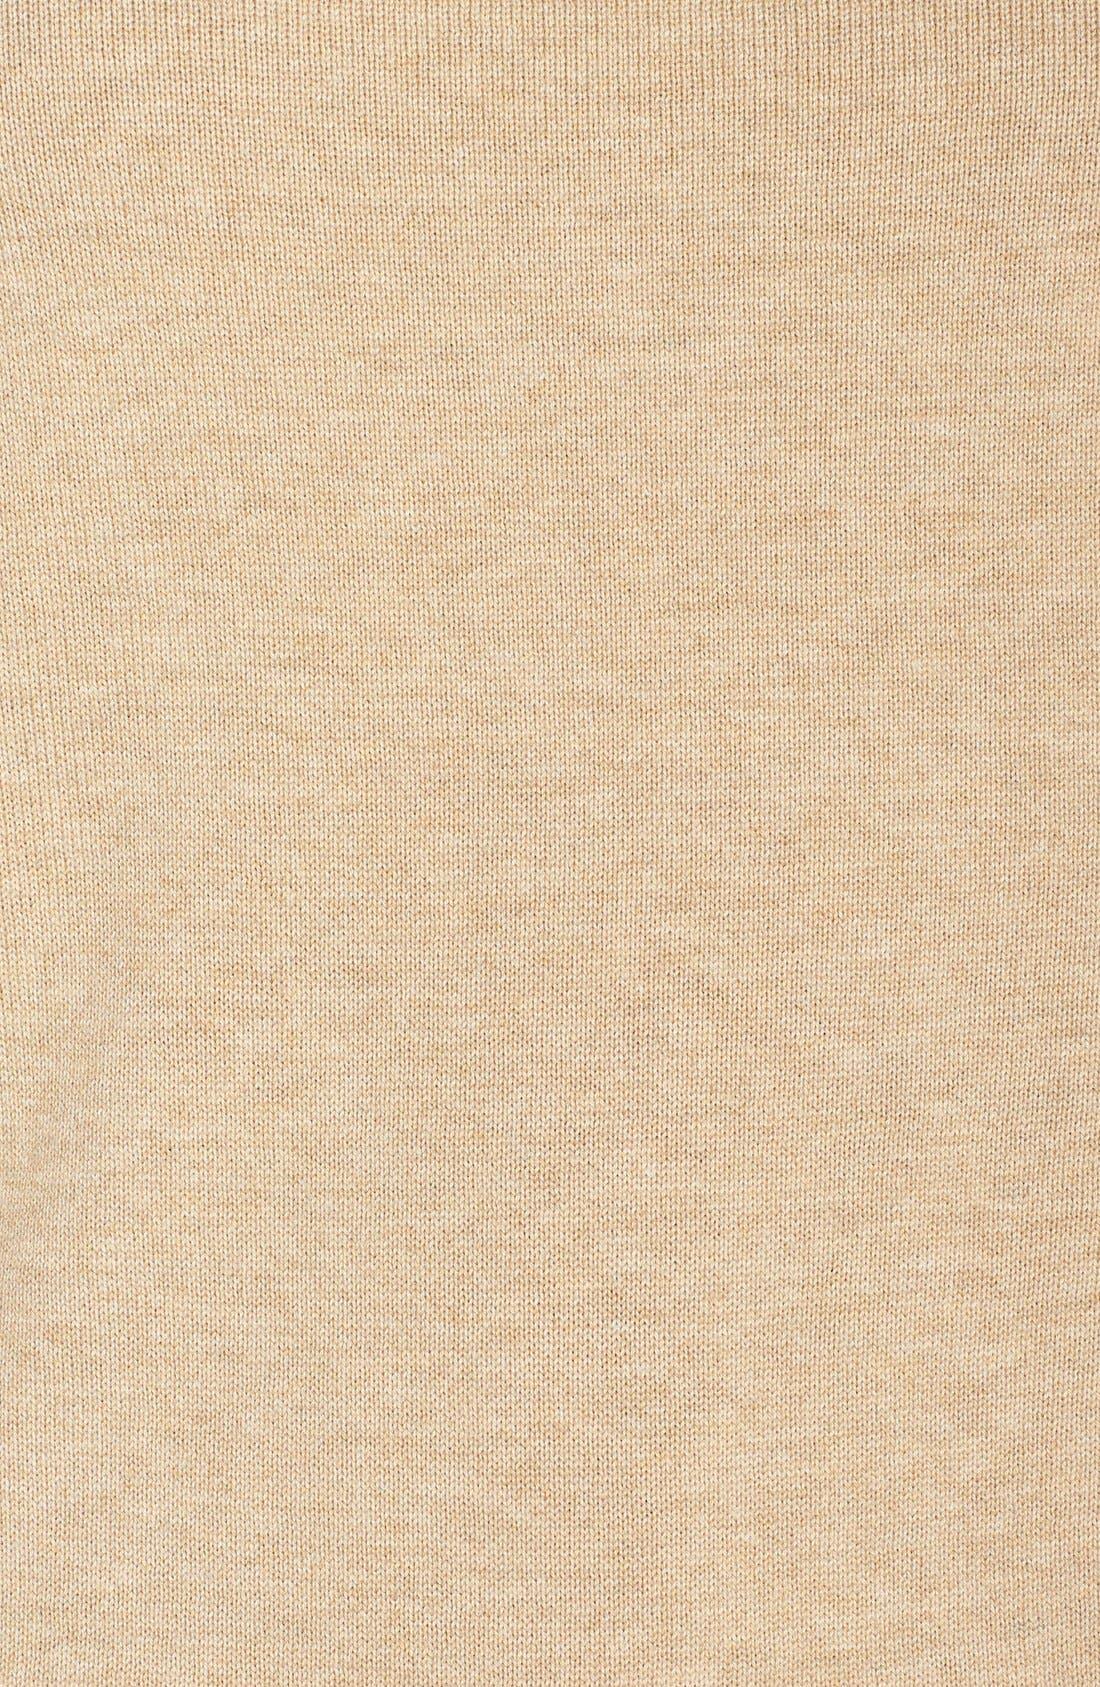 Alternate Image 6  - Fjällräven 'Vik' Cotton & Wool Pullover